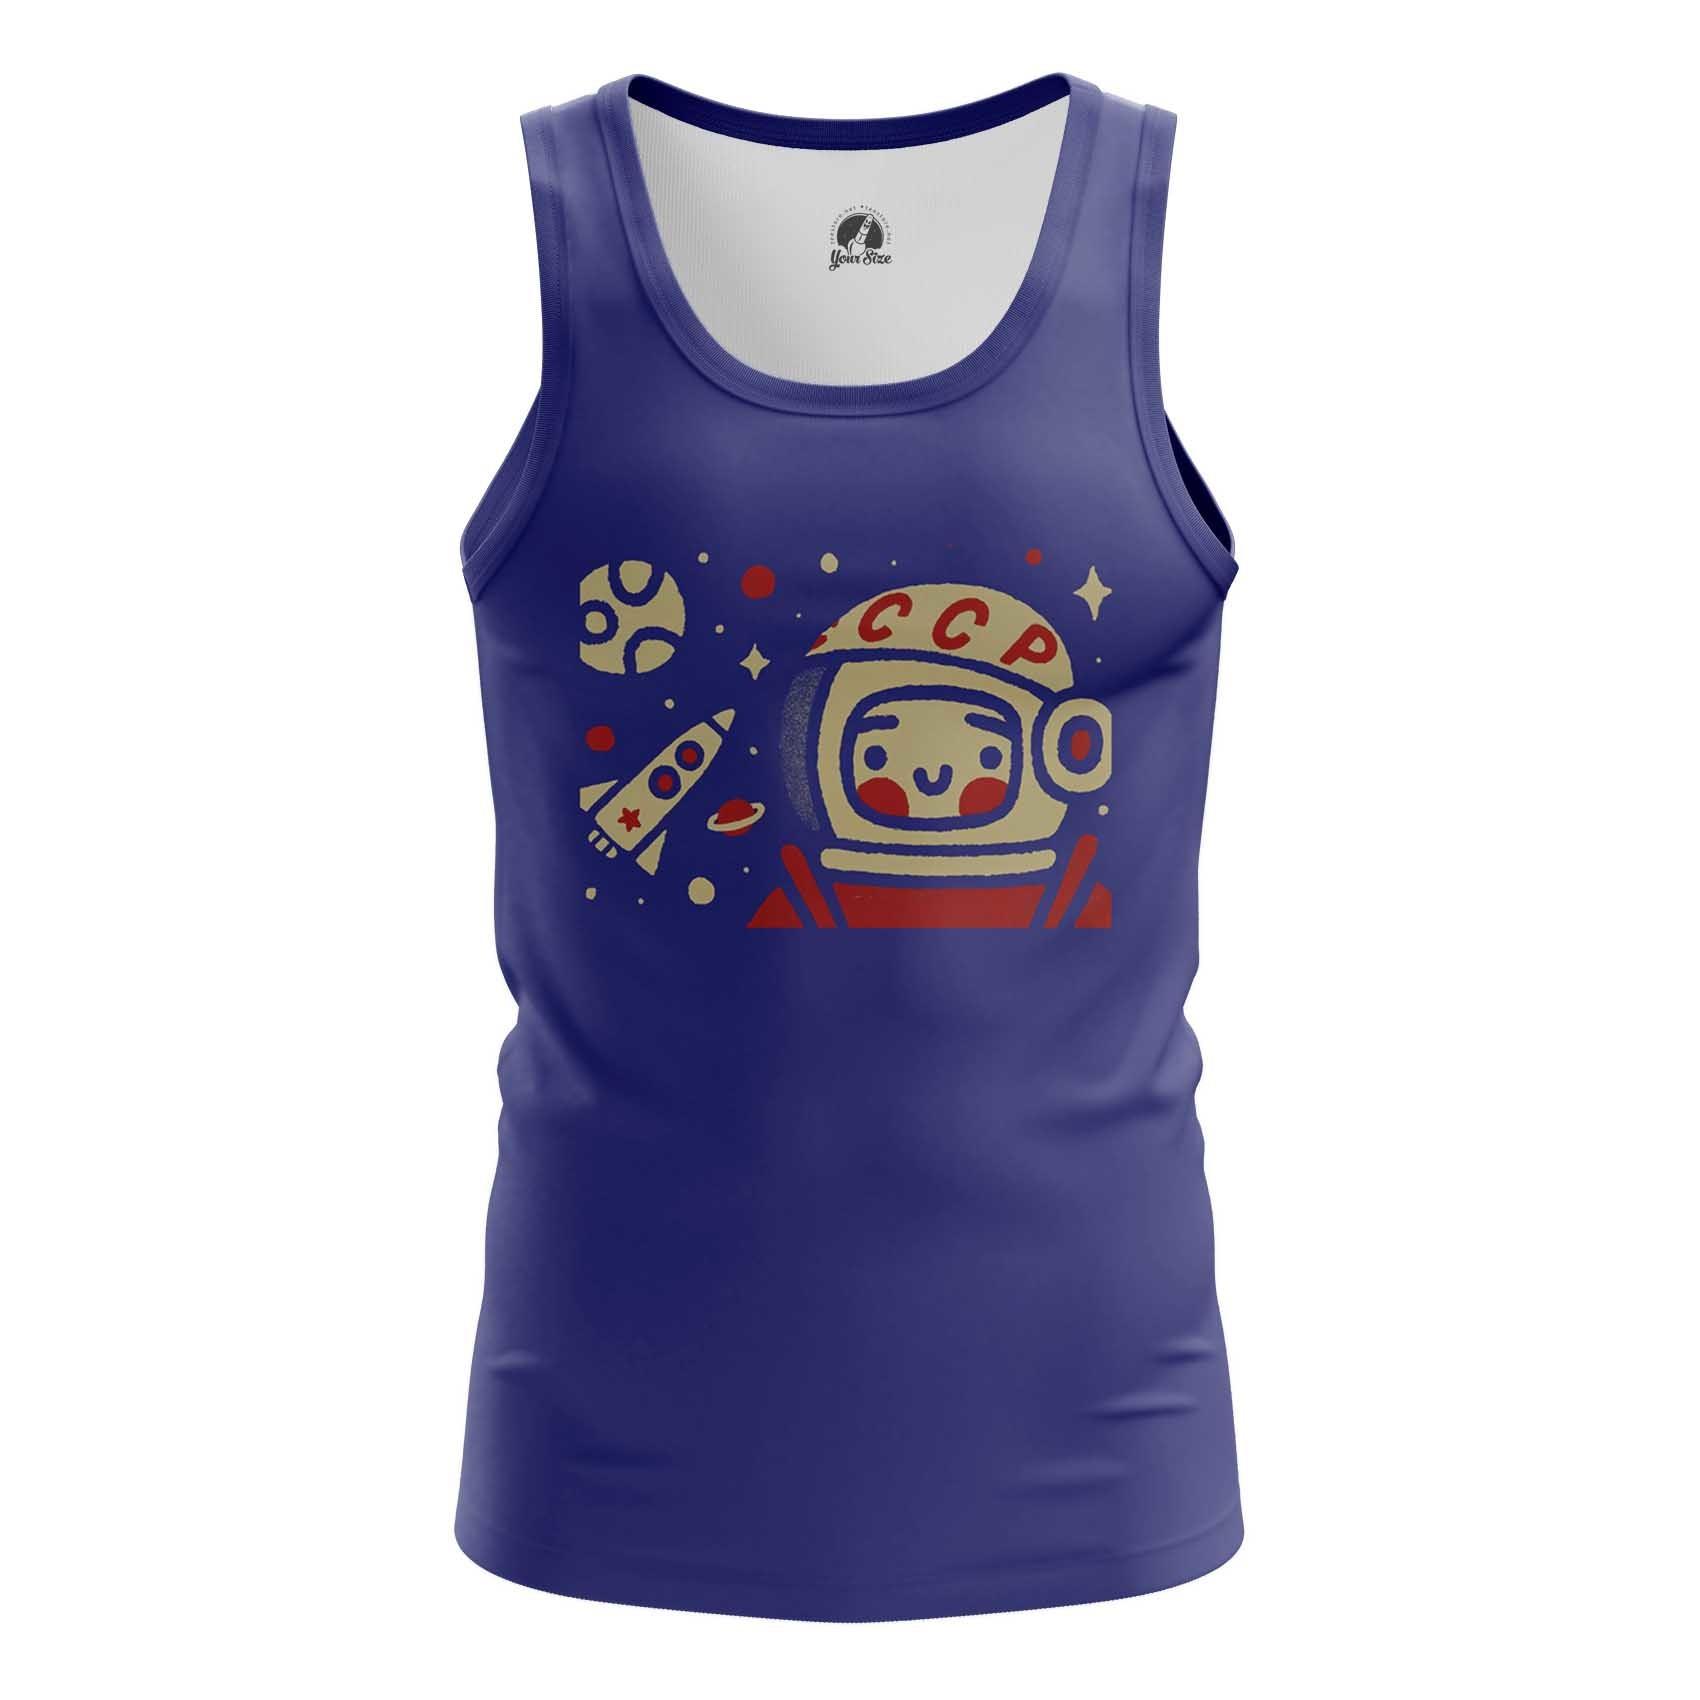 Merchandise Men'S Raglan Yuri Gagarin Space Merch